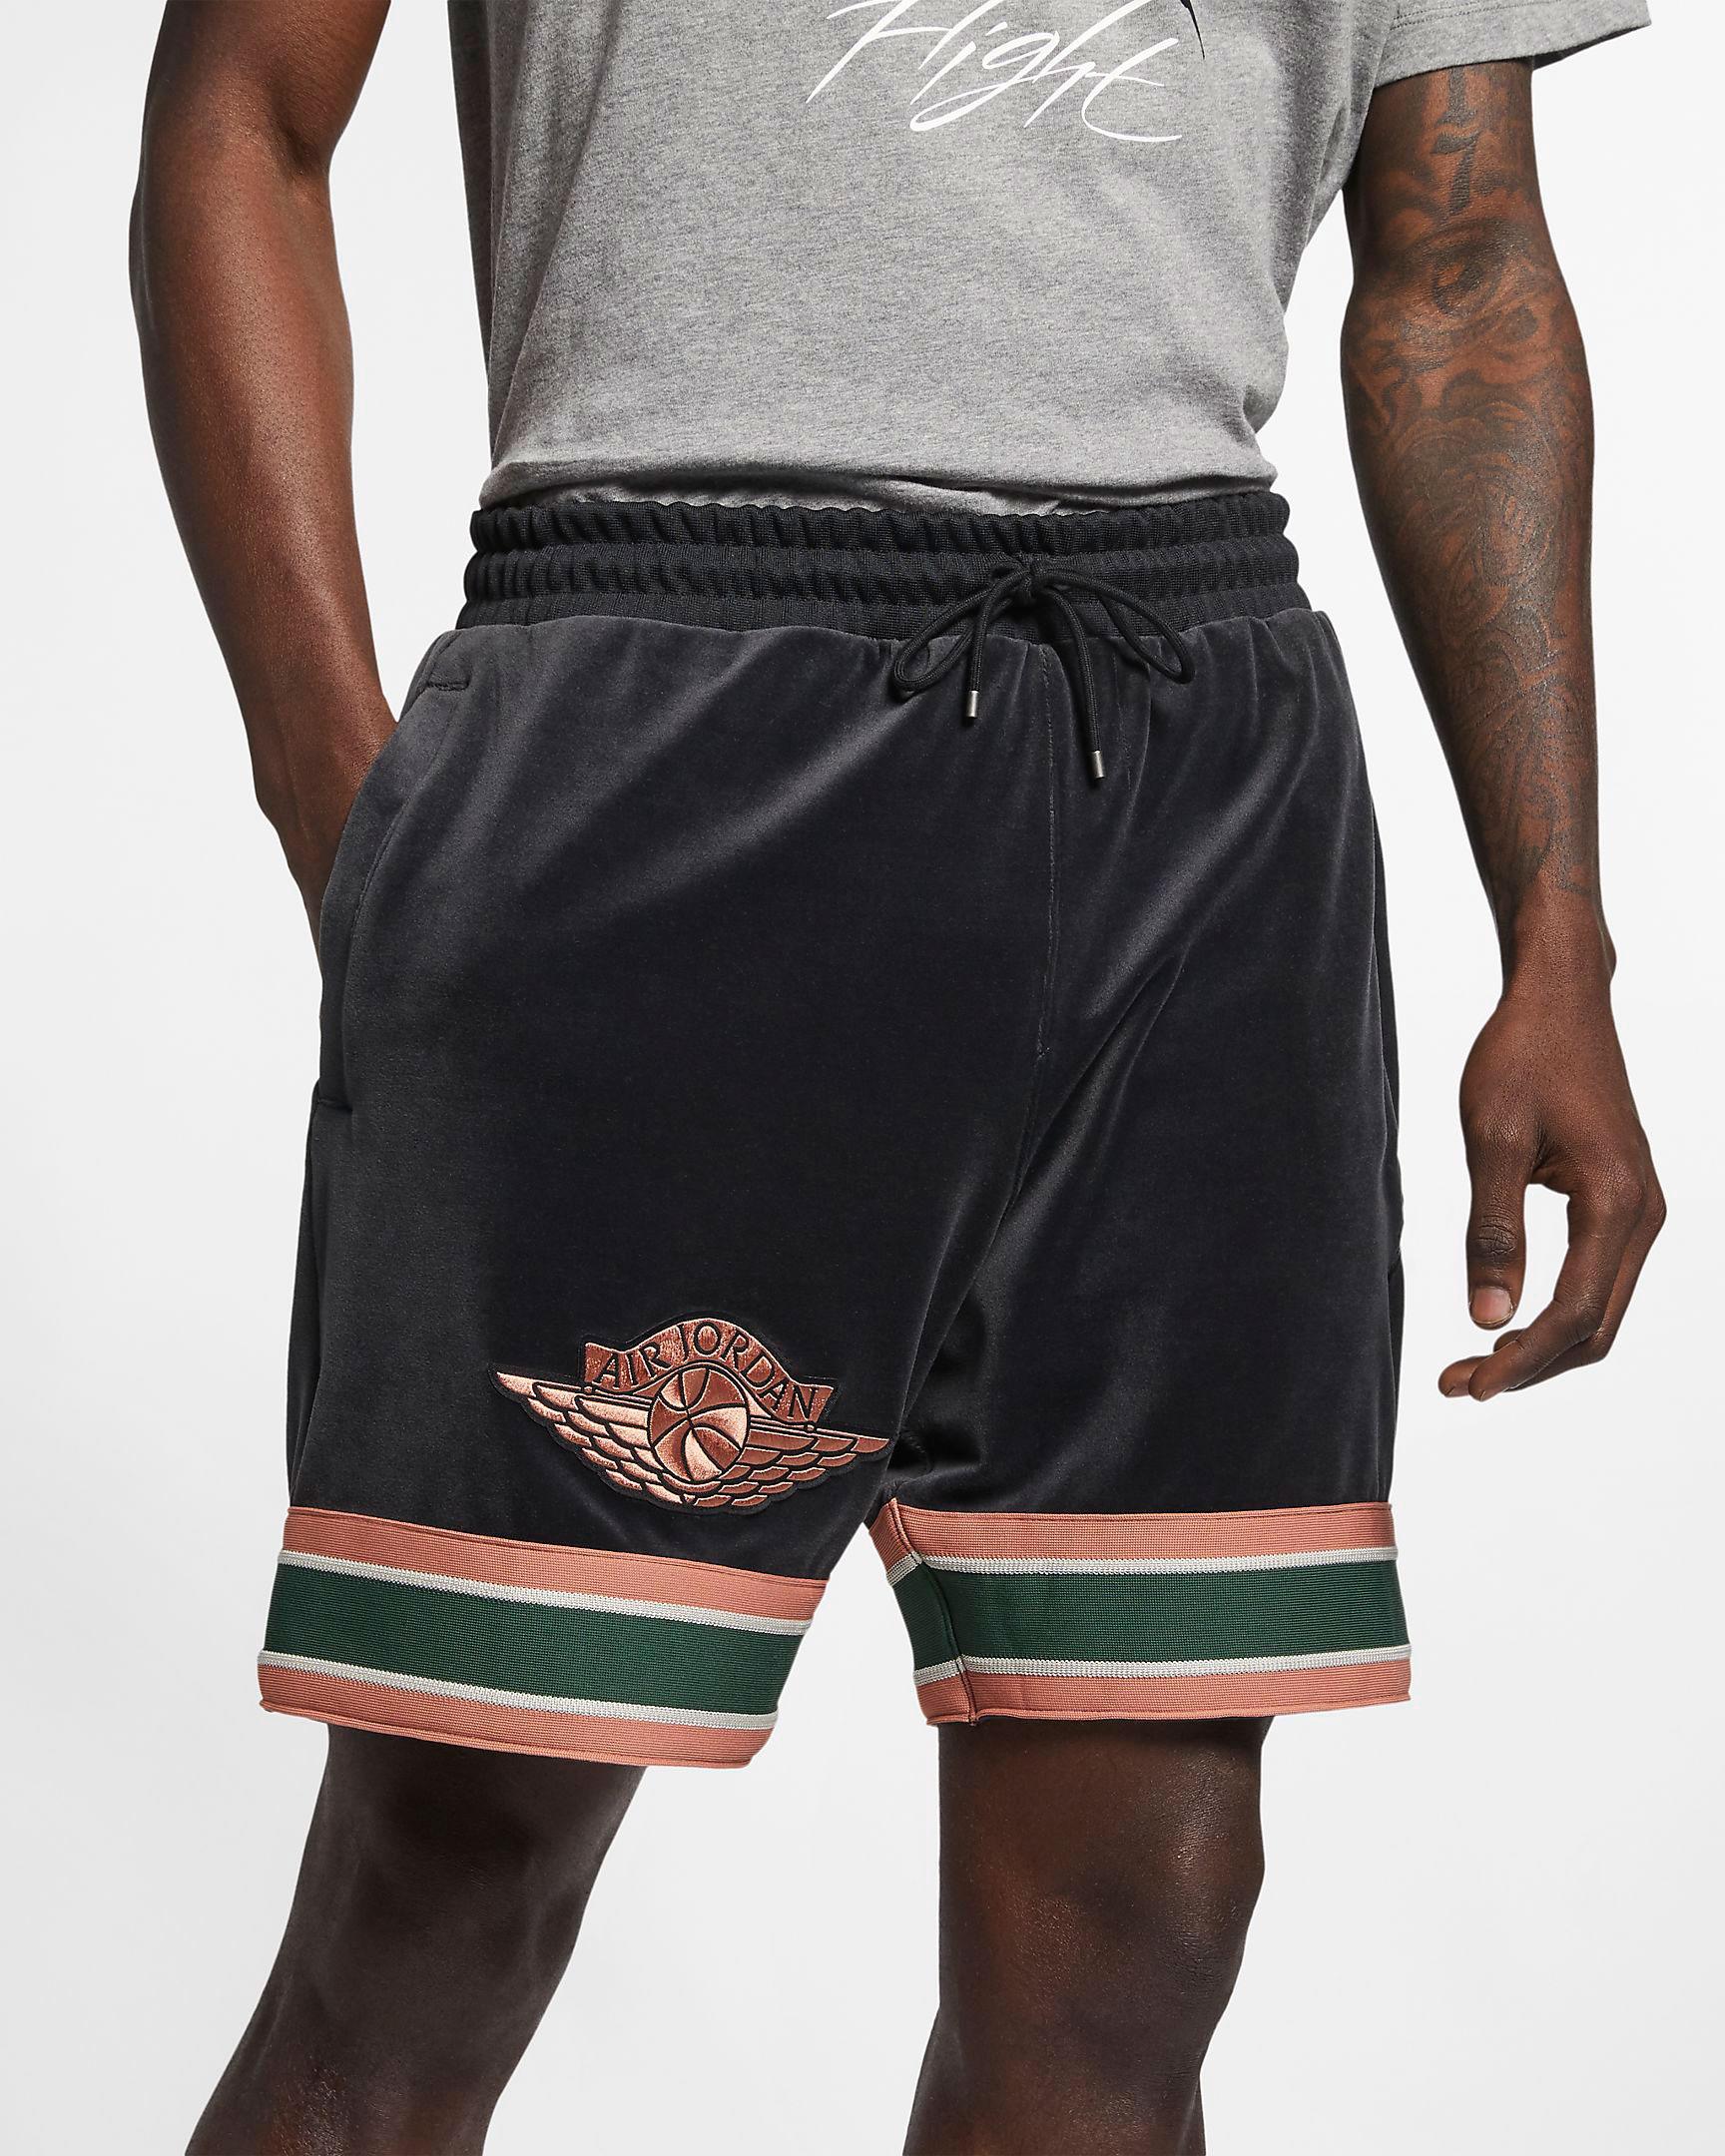 jordan-1-crimson-tint-matching-shorts-1